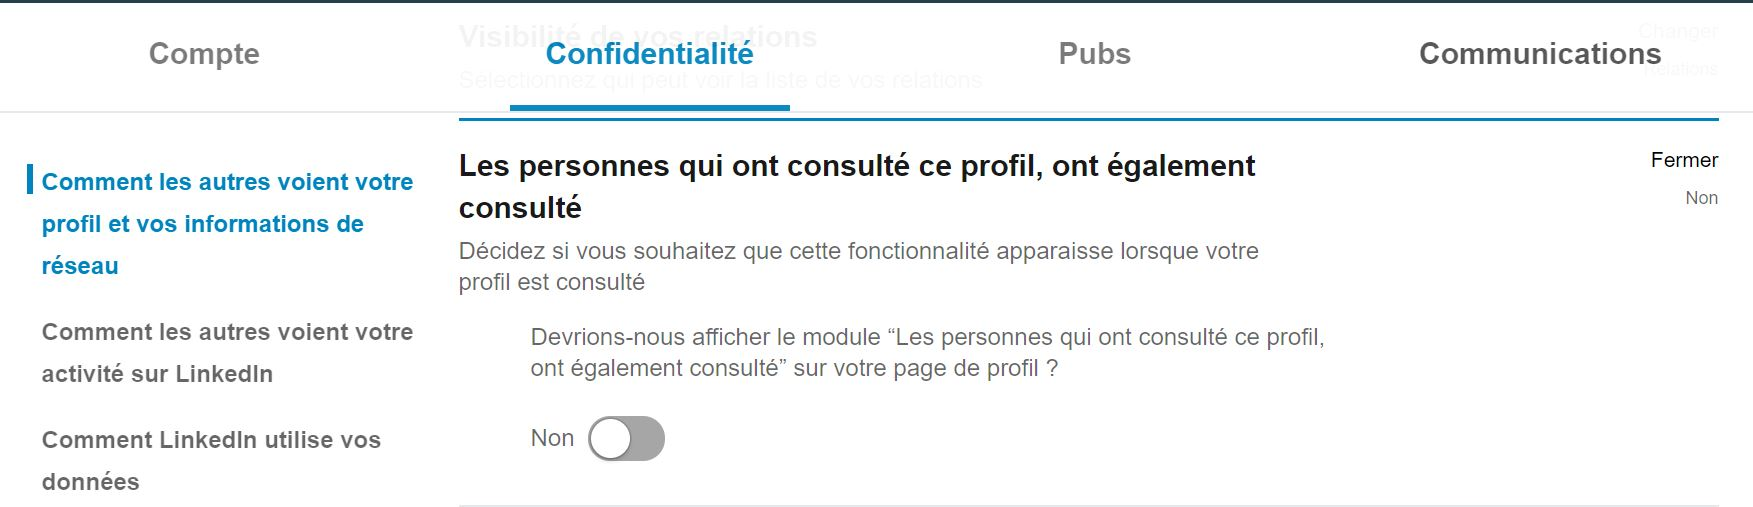 Utiliser LinkedIn : bloquer les profils similaires